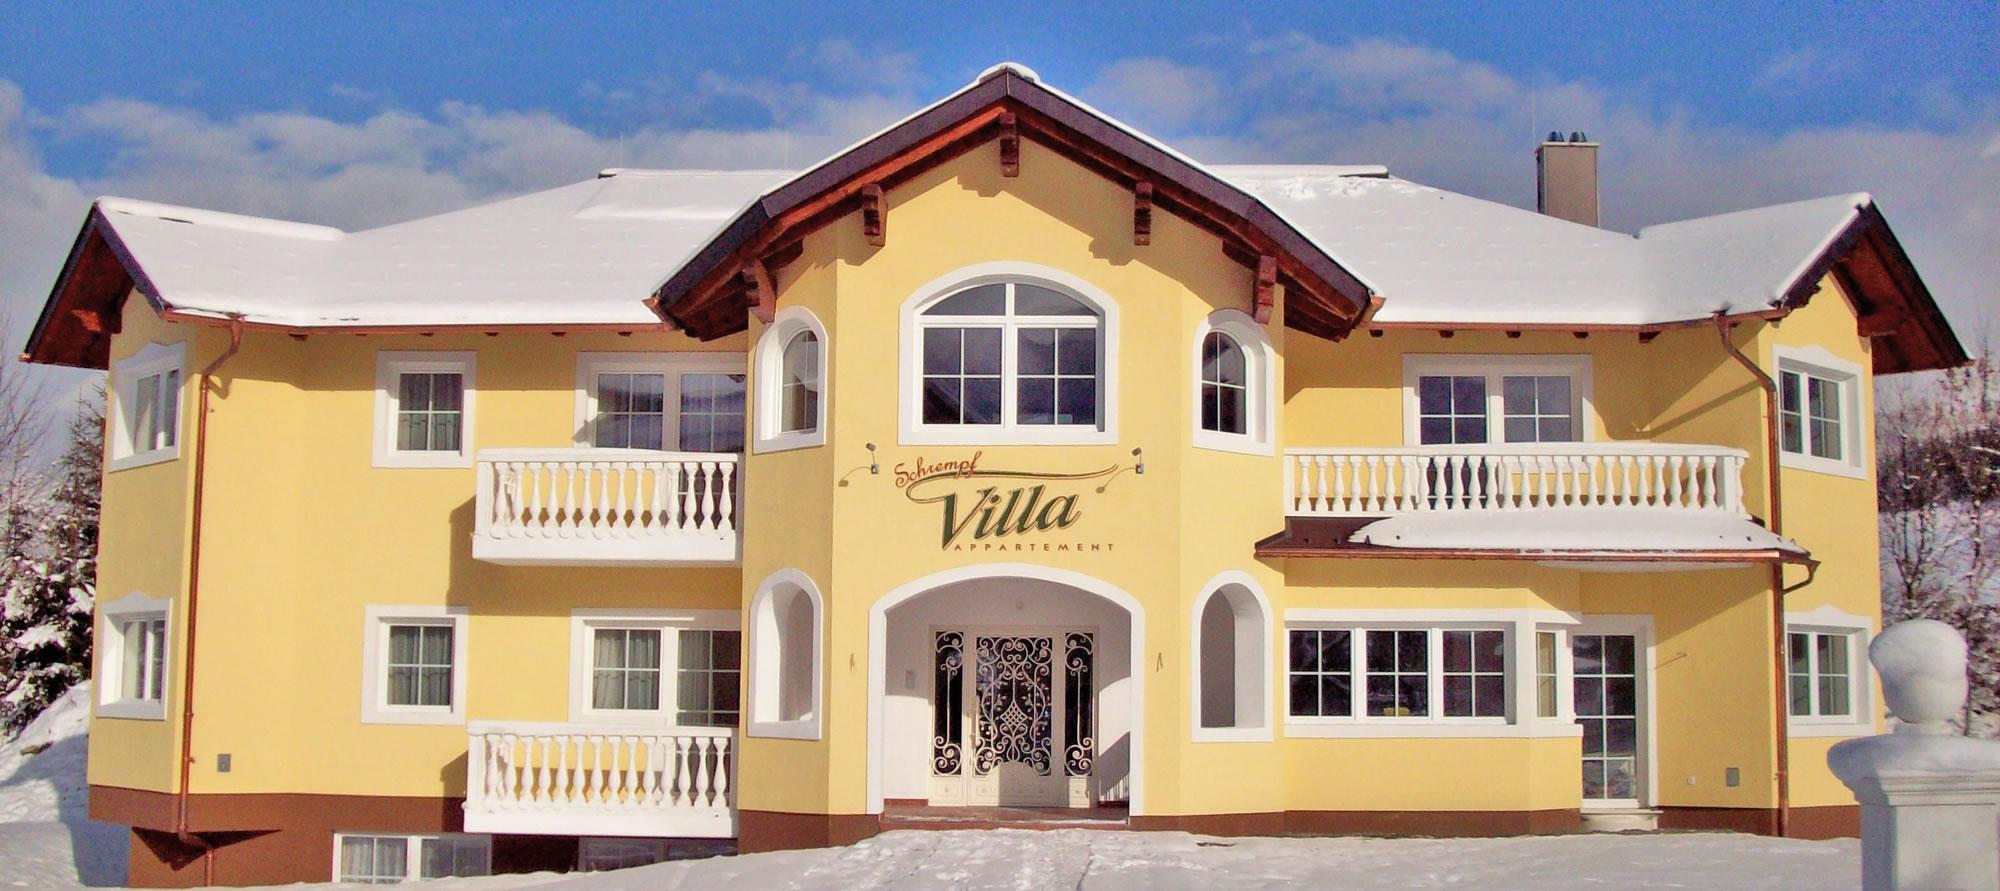 appartements villa schrempf paradies schrempf flachau. Black Bedroom Furniture Sets. Home Design Ideas